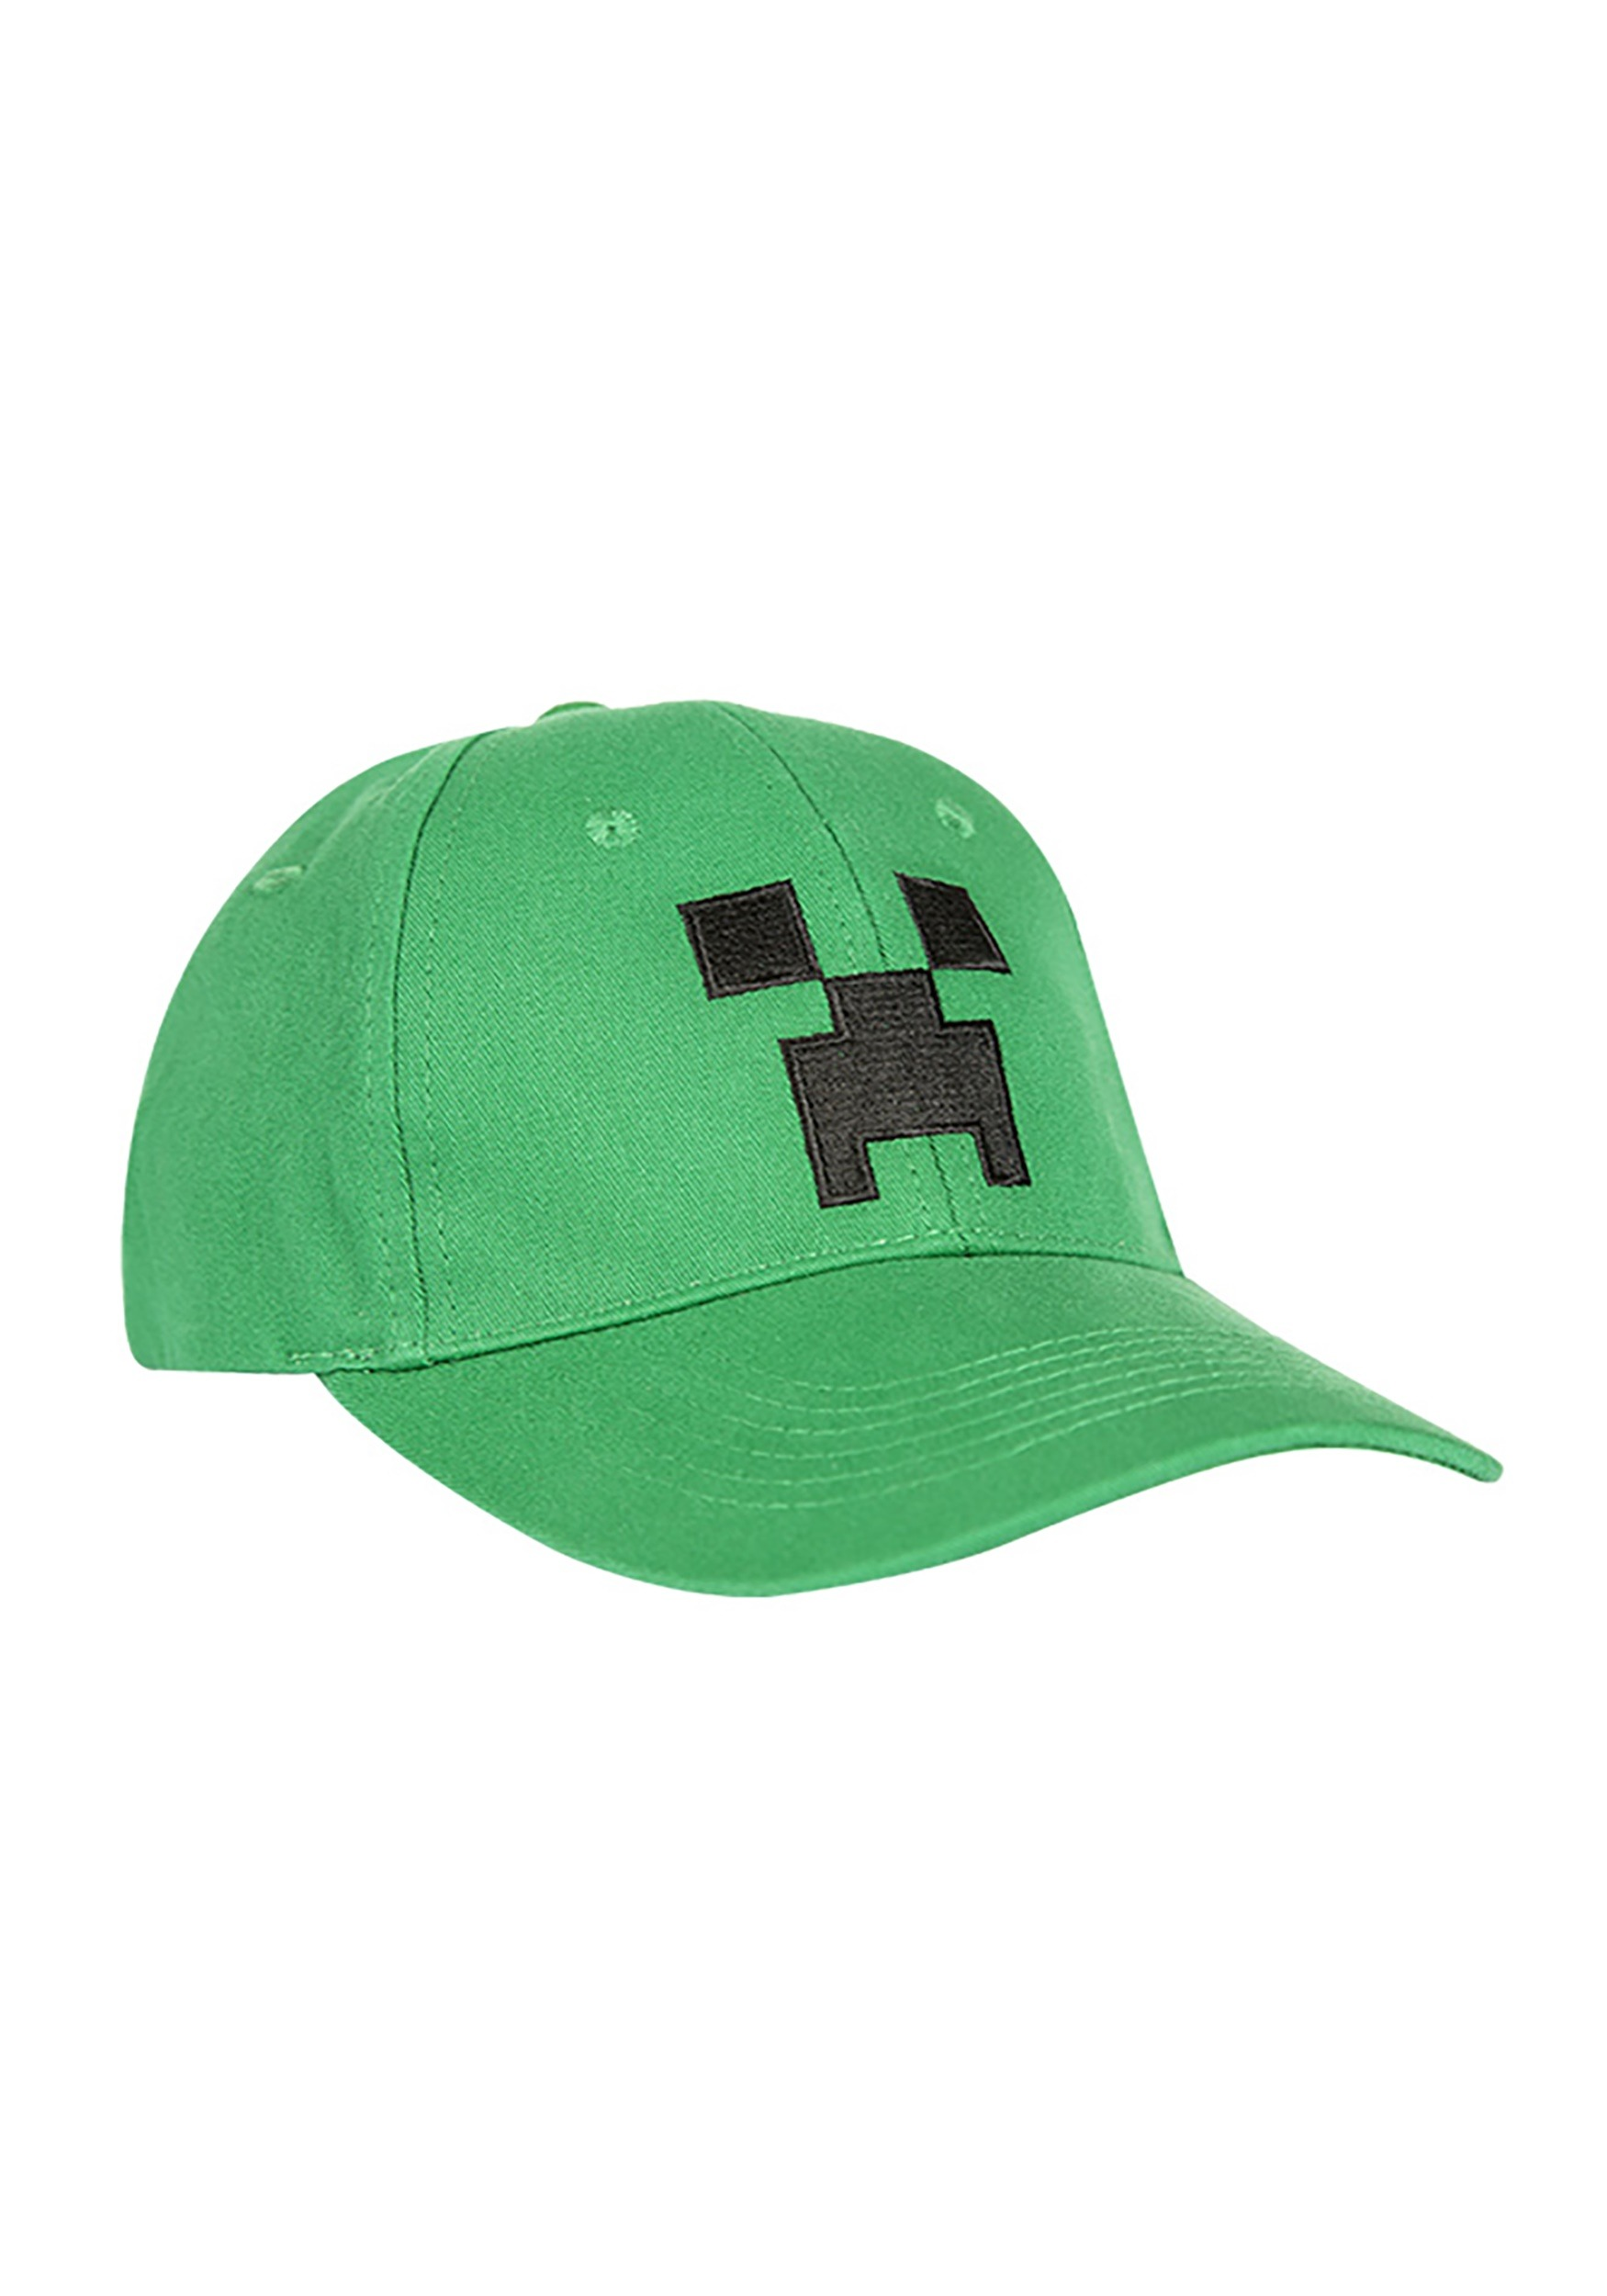 1af6b2515c9ca Creeper Snap-back Minecraft Hat